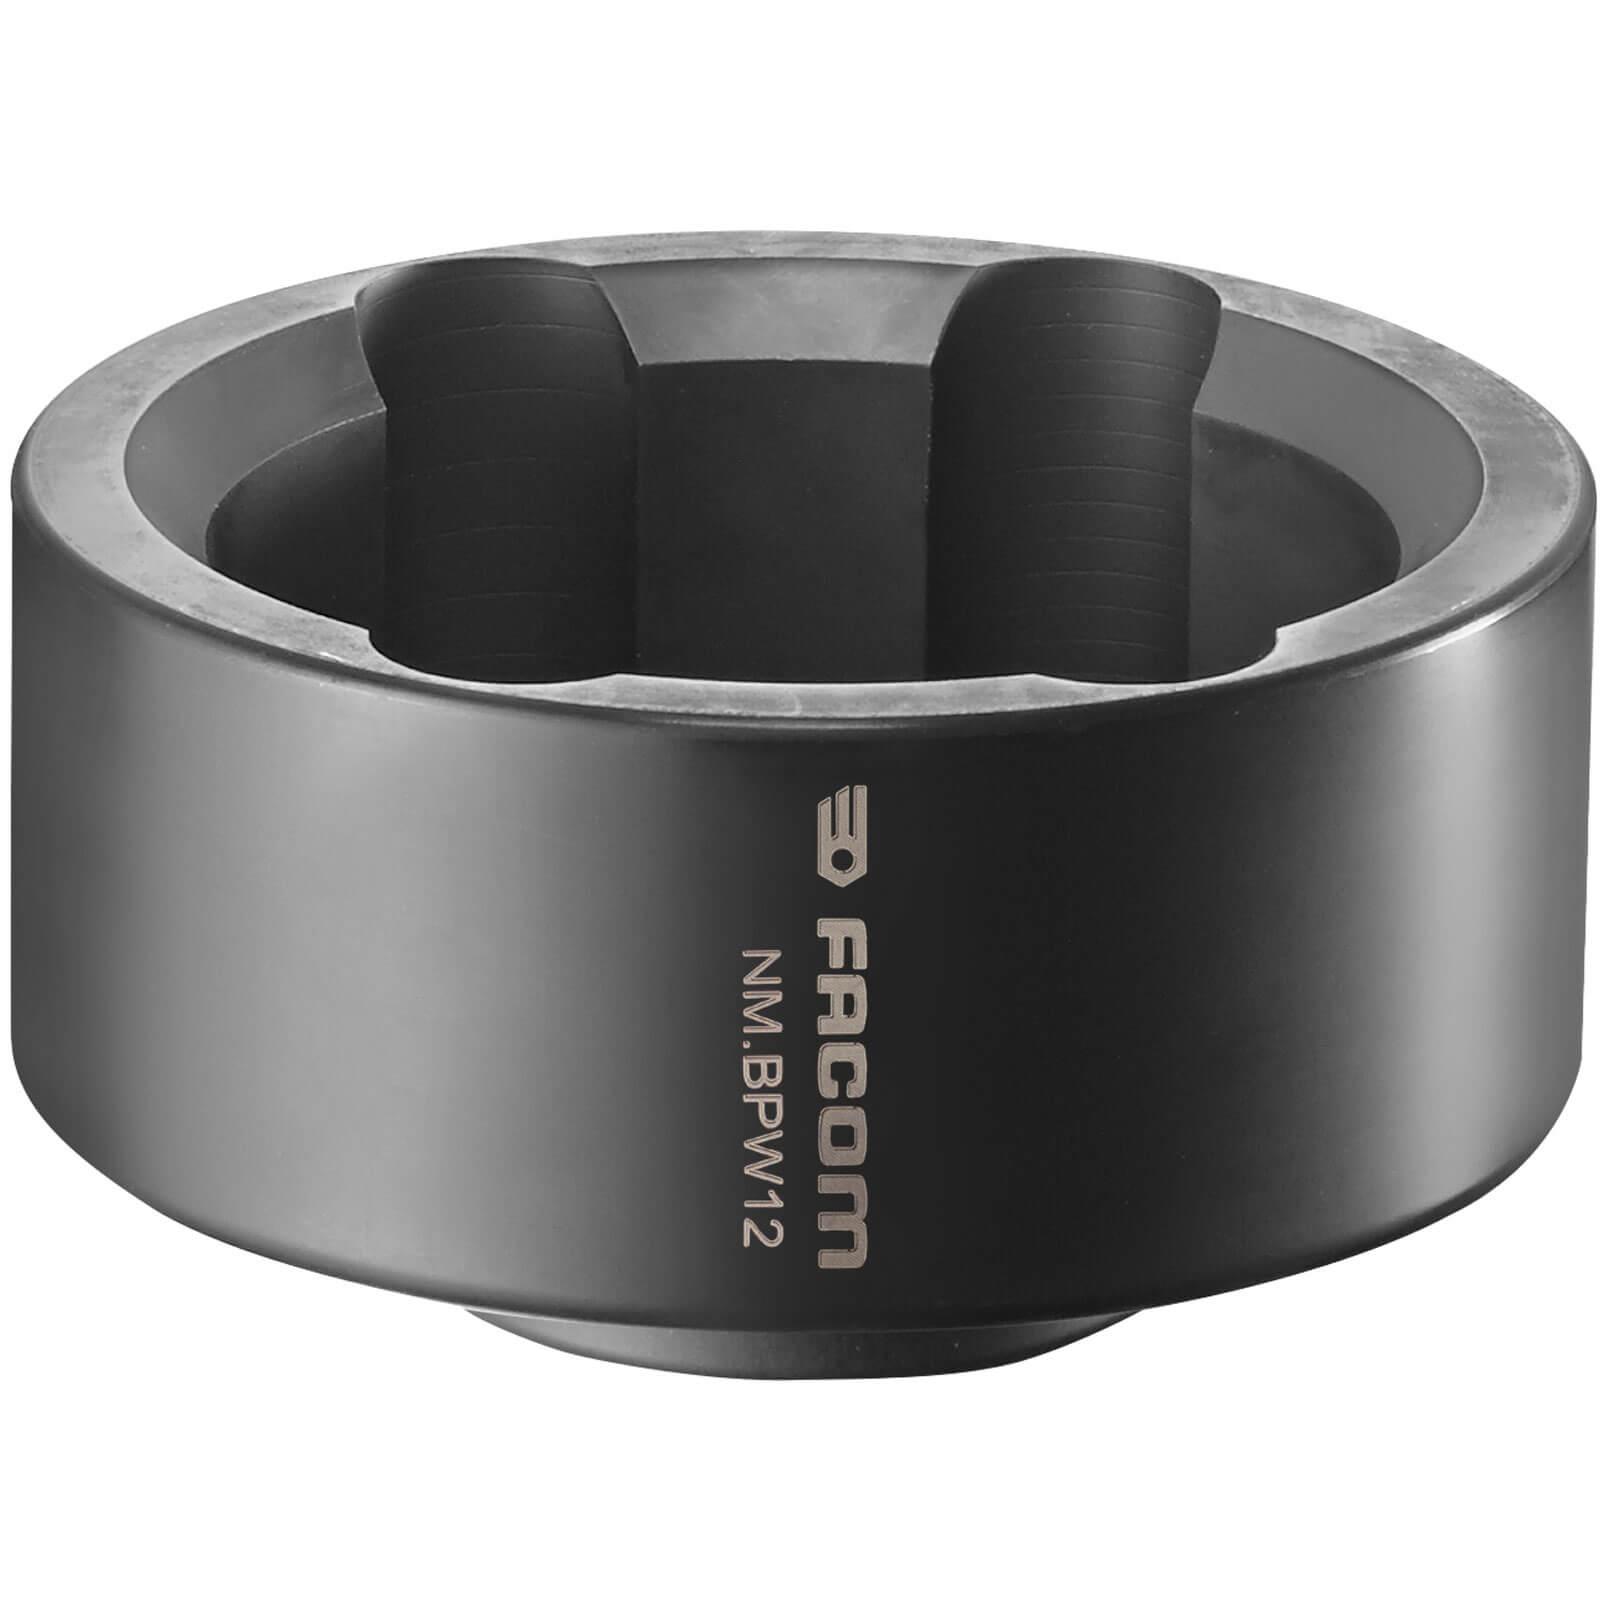 Facom 1 Drive Hub Nut Socket for BPW Trailer Hubs 1 74mm